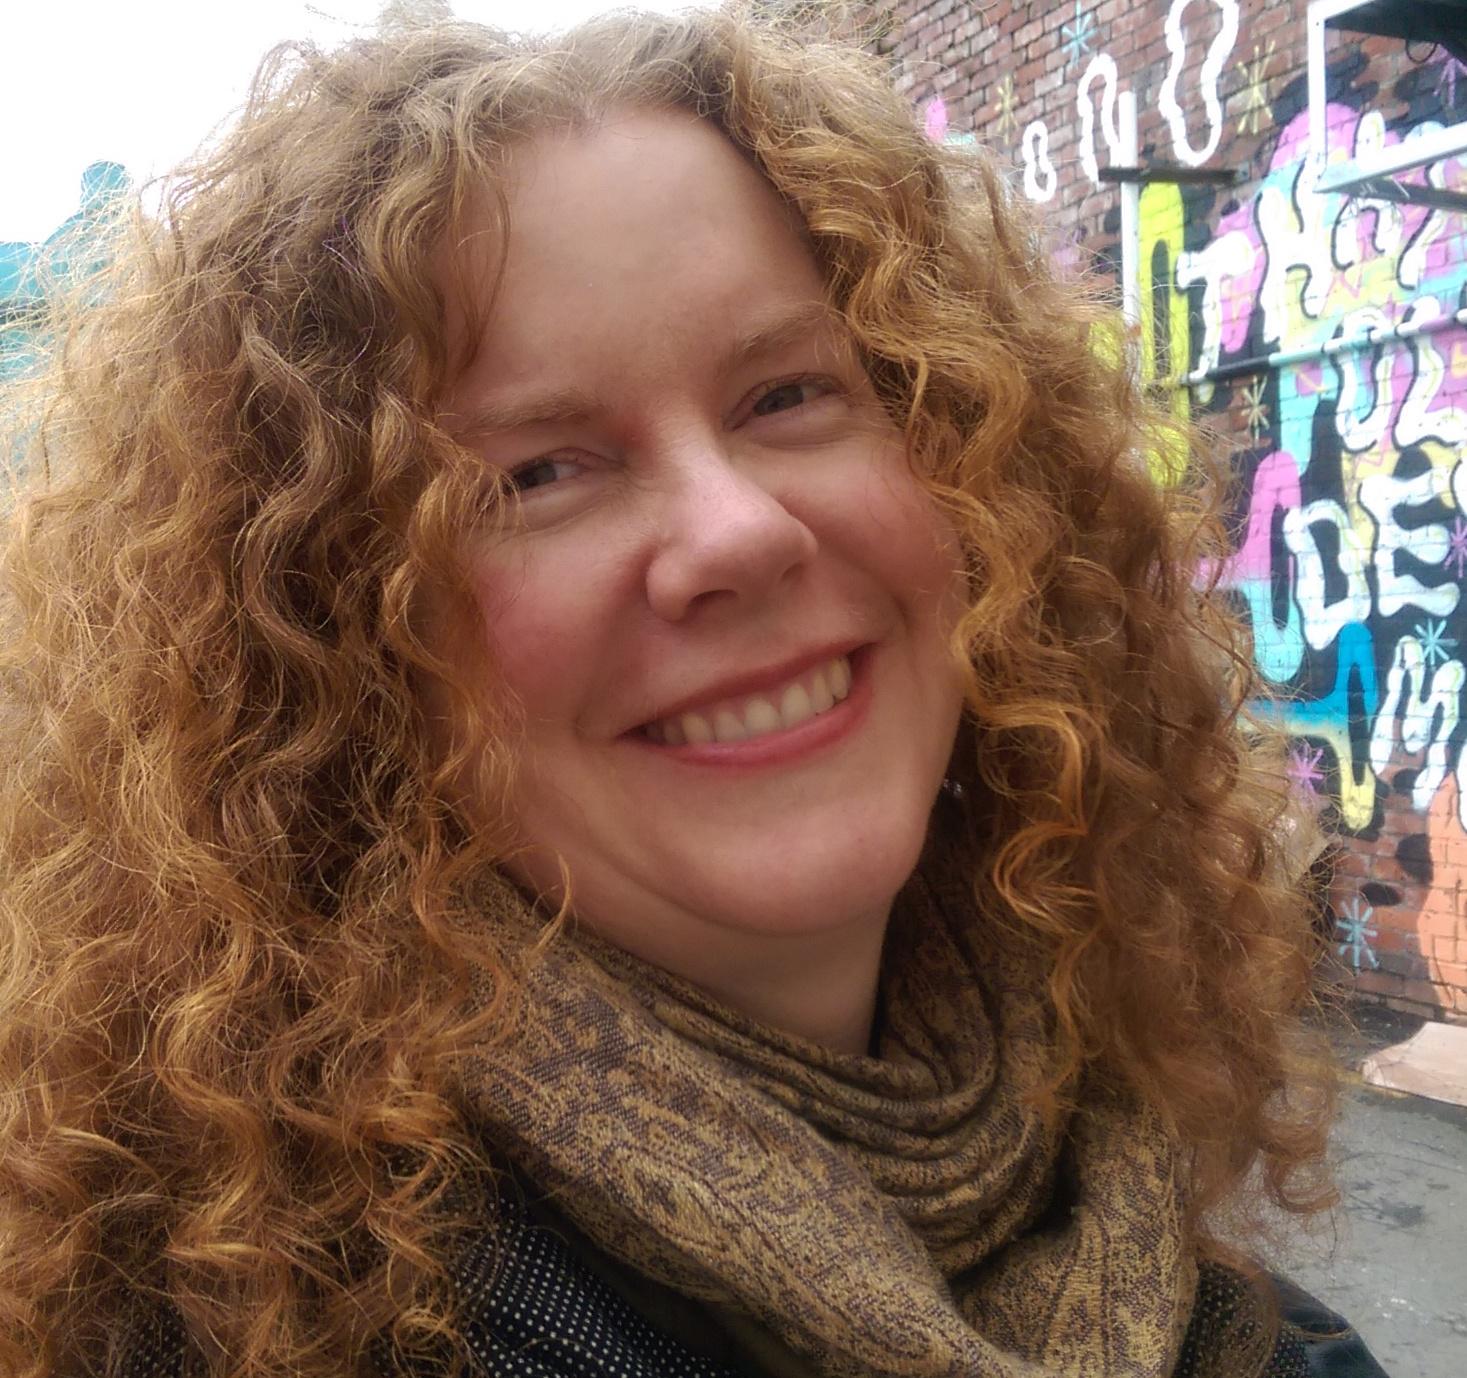 Alison Stringer   FabLab Wgtn (Wellington, New Zealand), Genomics for Aotearoa New Zealand, Space and Science Festival NZ